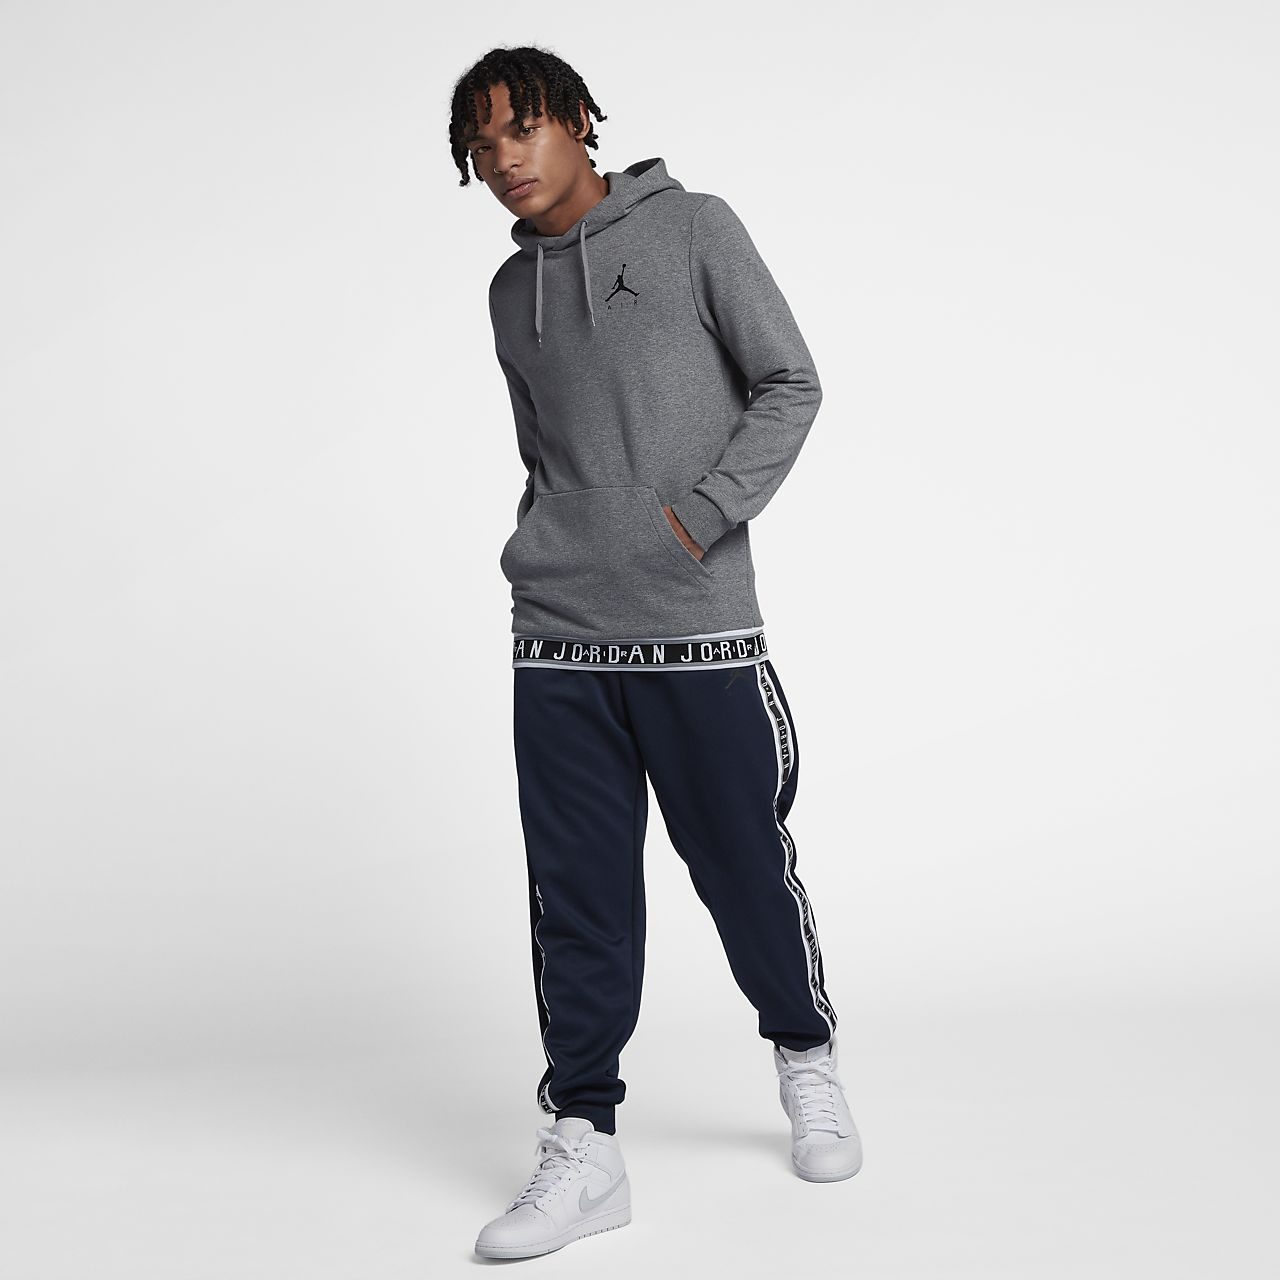 db69faf8efbabf Jordan Jumpman Air Men s Basketball Pullover Hoodie. Nike.com NO